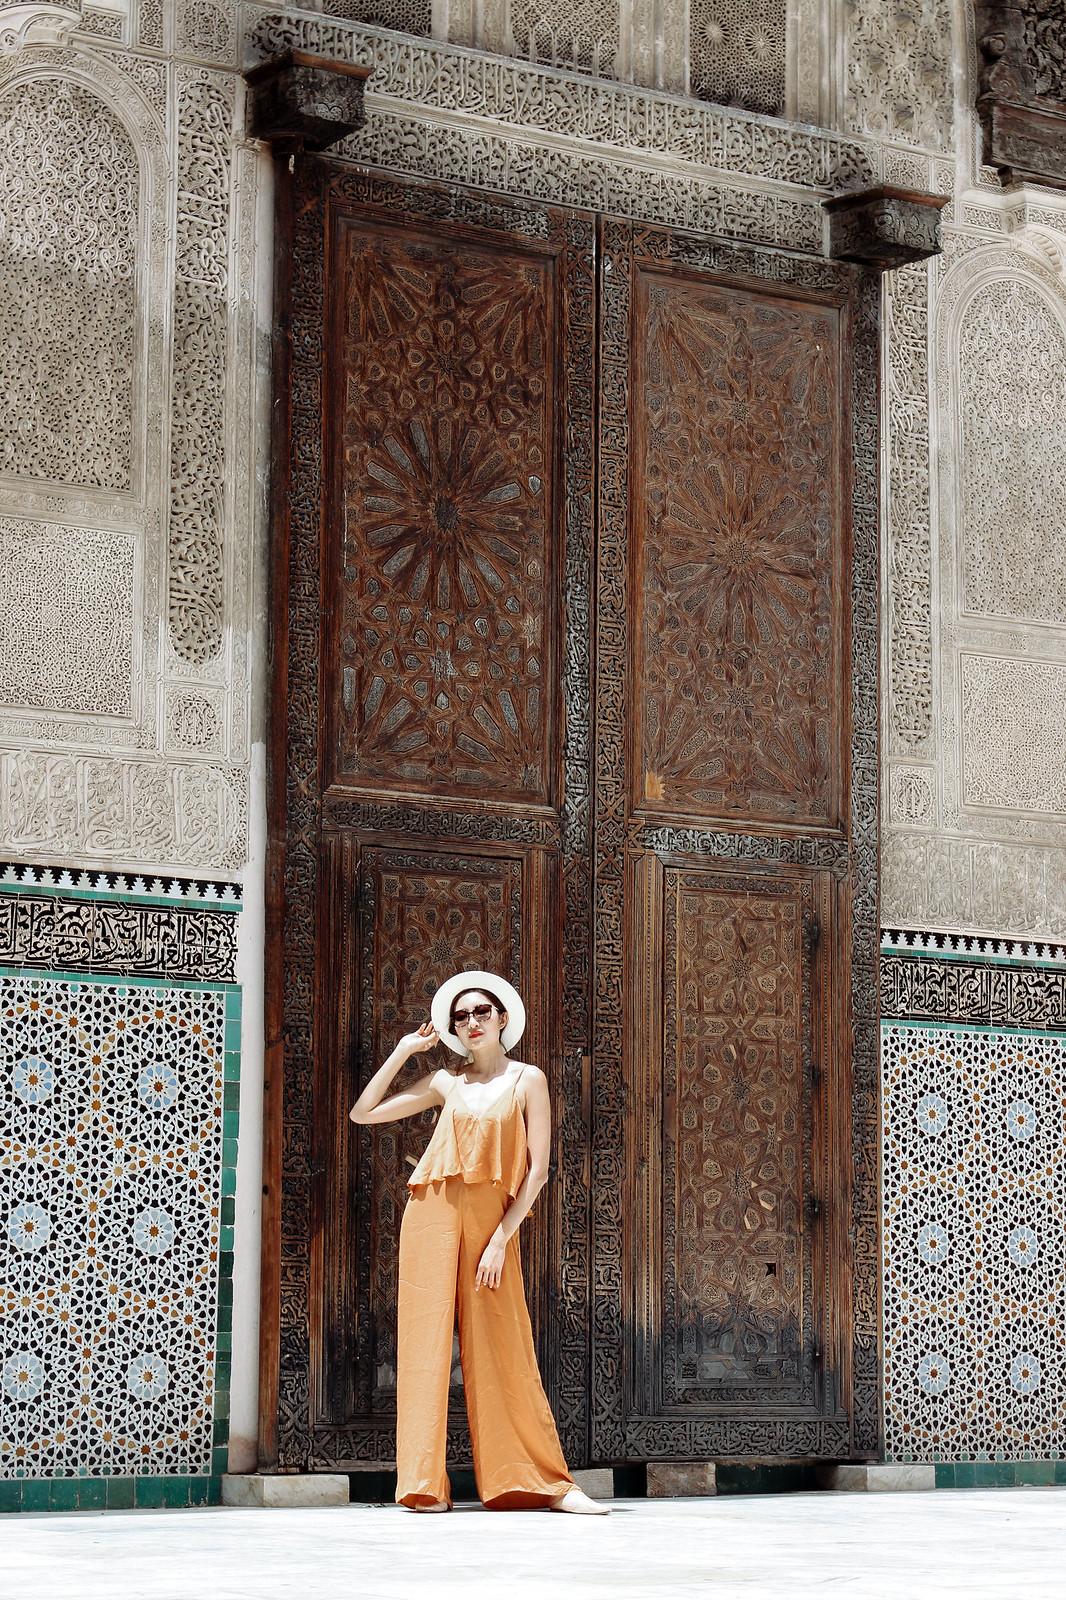 Fes Morocco - kisses,vera-53